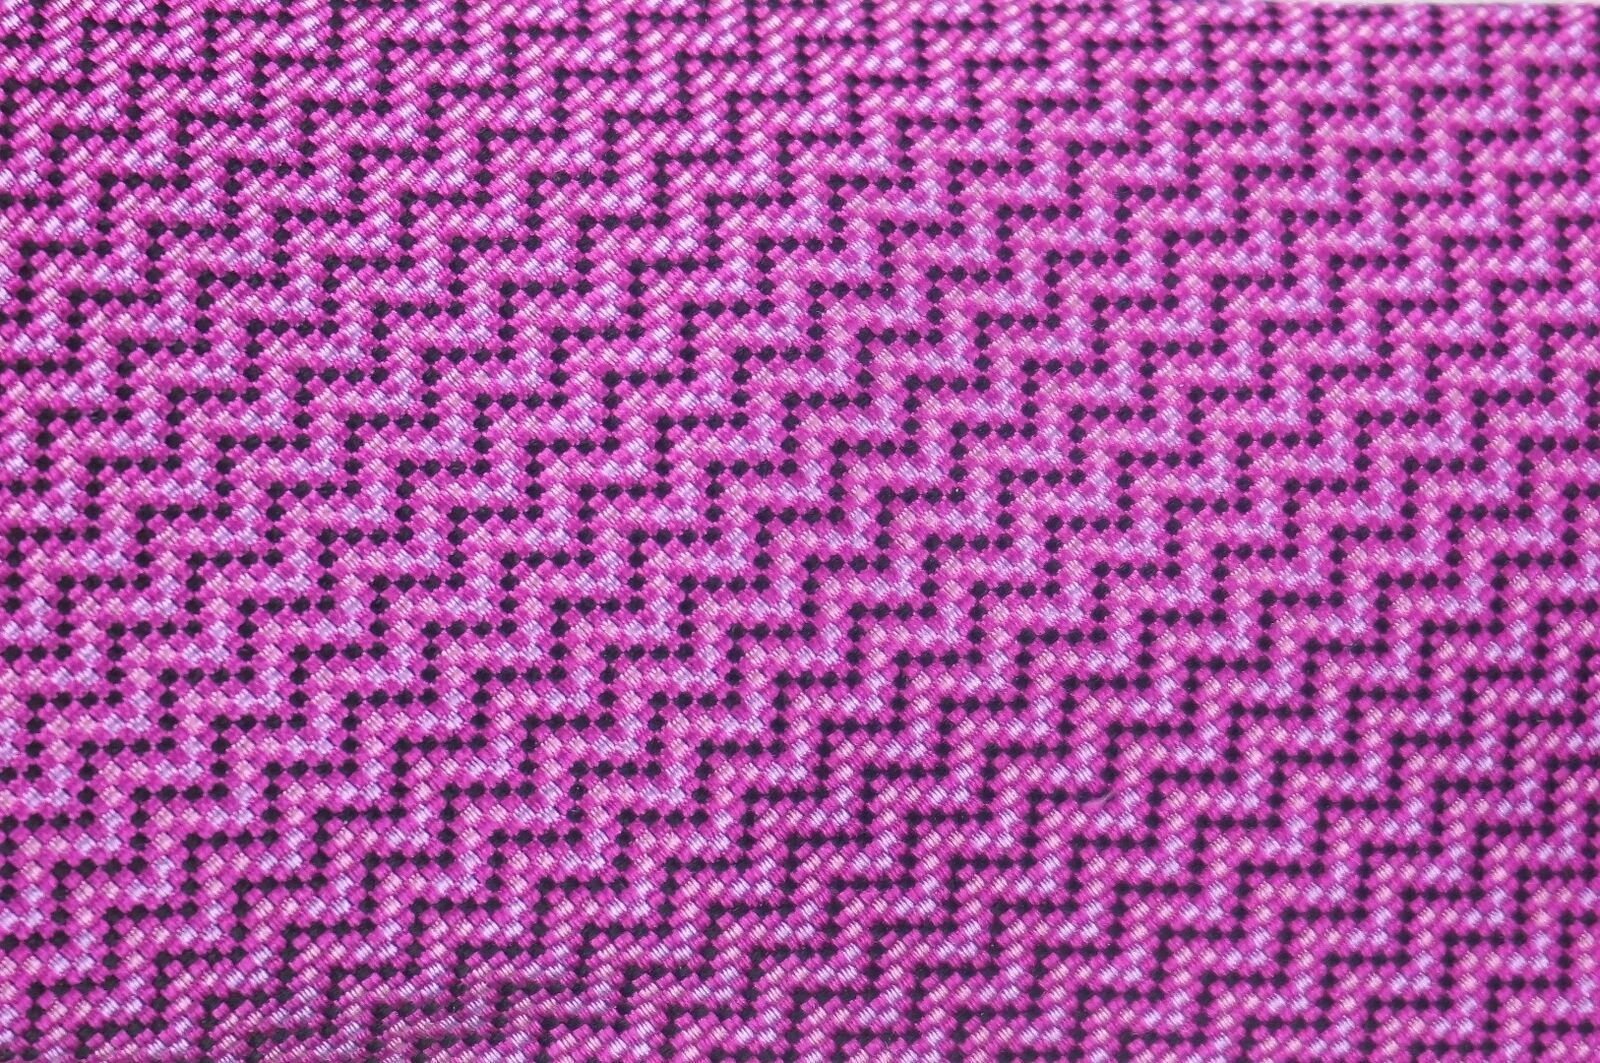 NEW ALFANI RED LABEL BERRY PINK RICHMOND GEOMETRIC 100% SILK NECK TIE